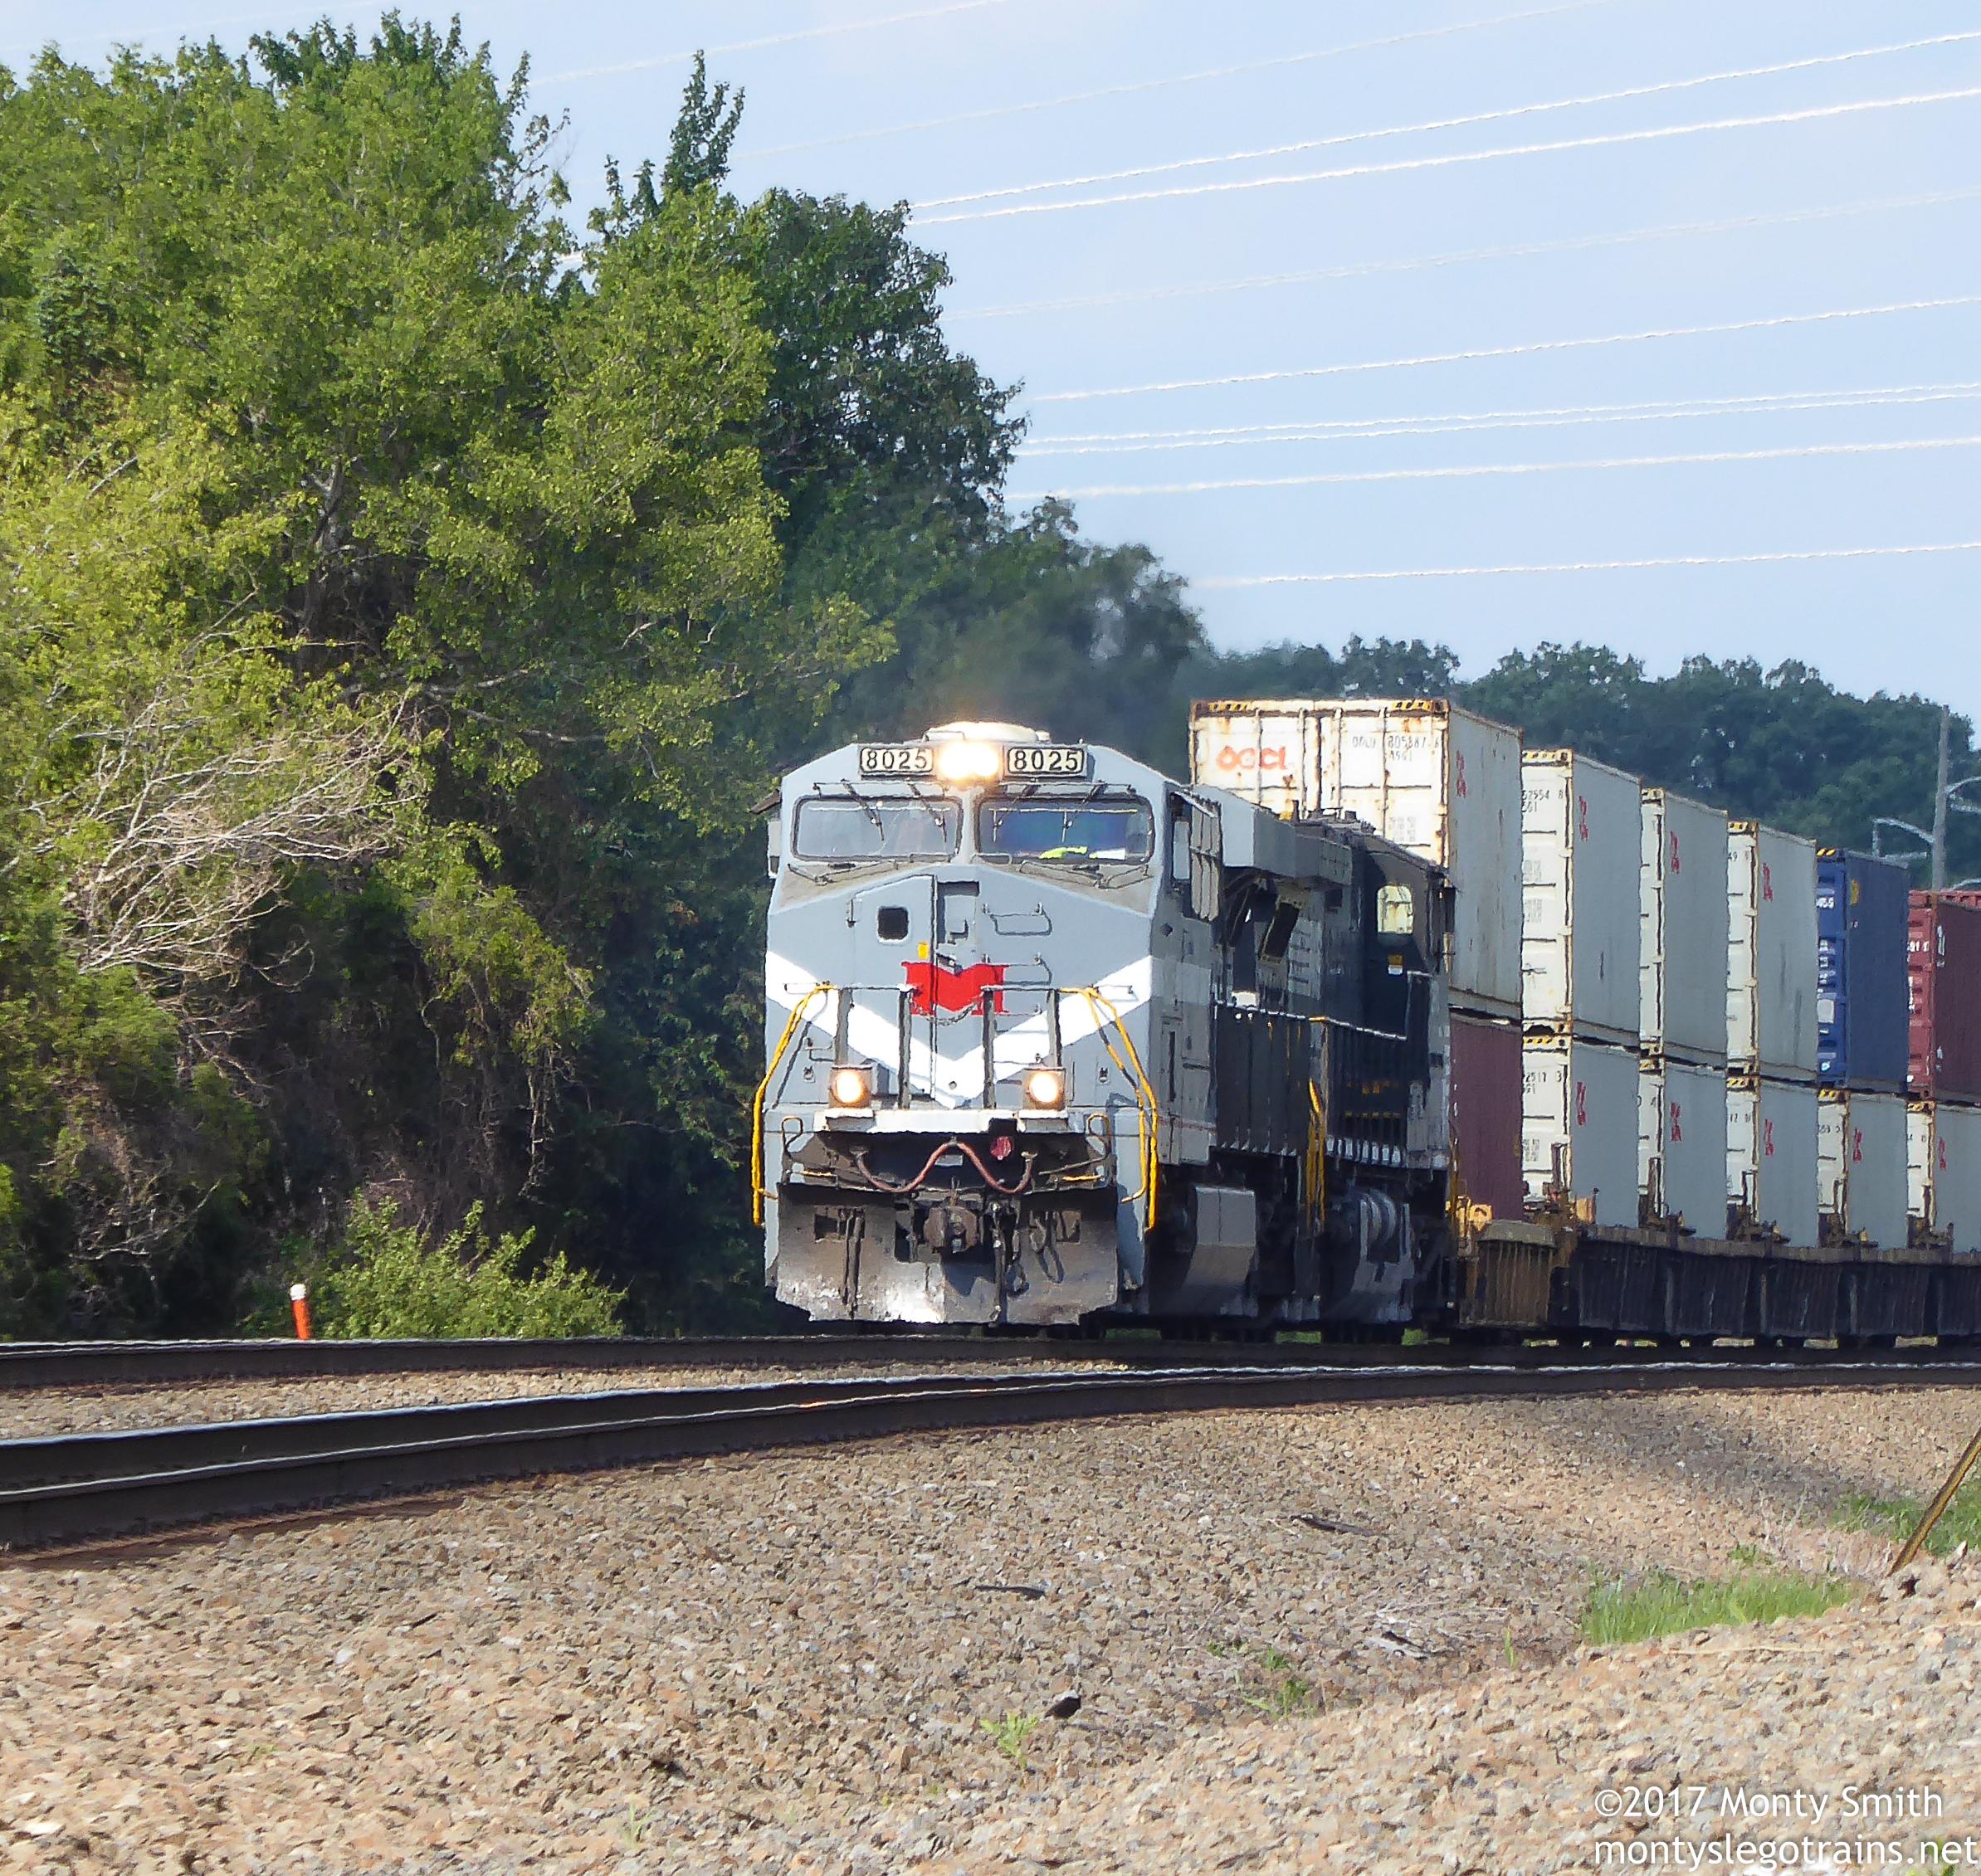 228 rolls south after passing through Manassas, VA